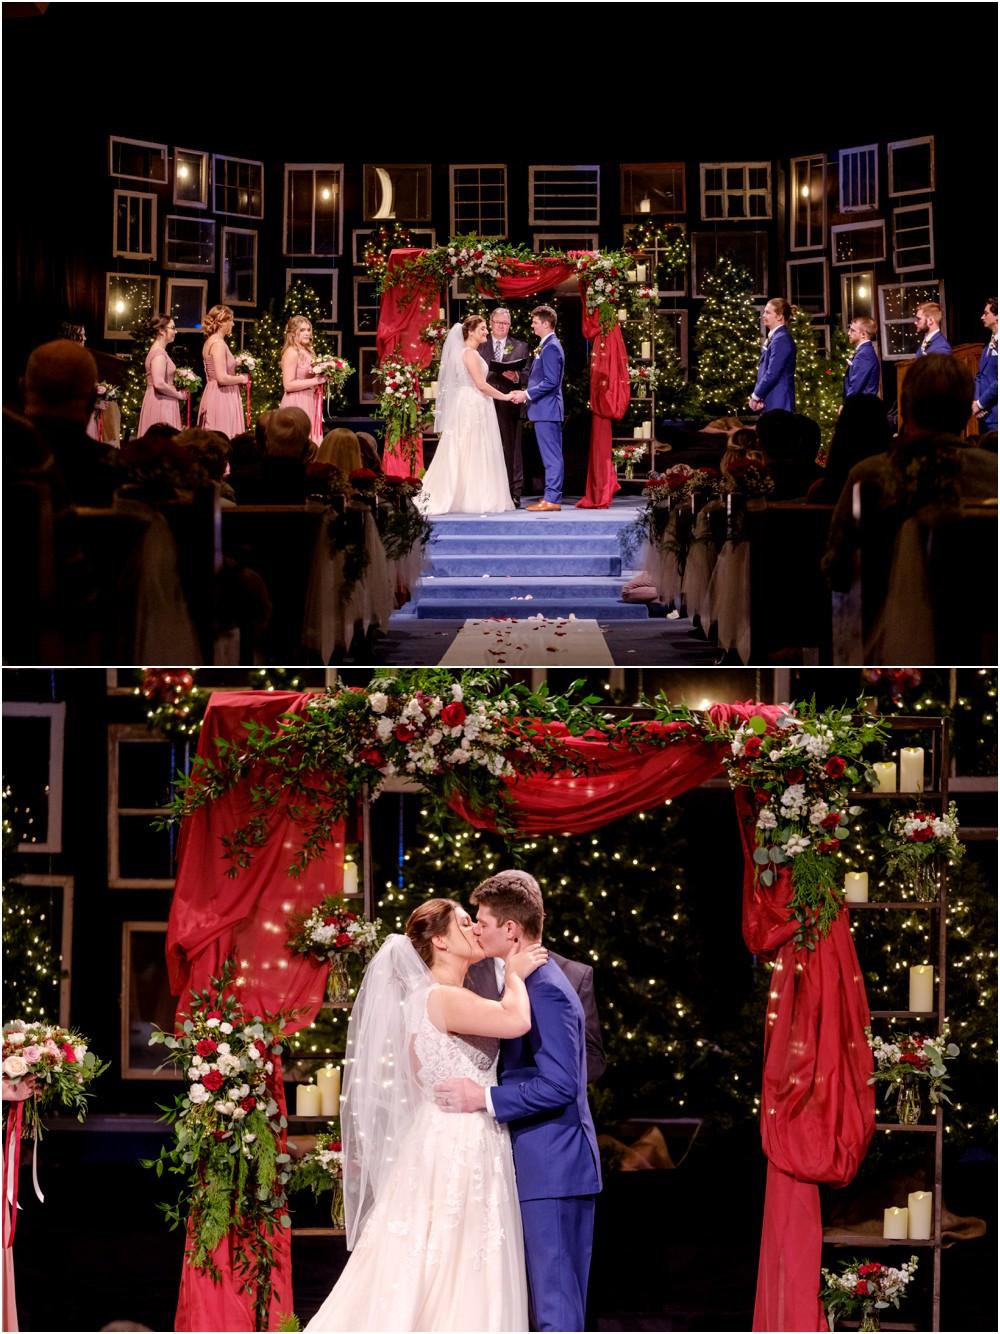 Washington-TownshipPark-Wedding-Pictures_0011.jpg